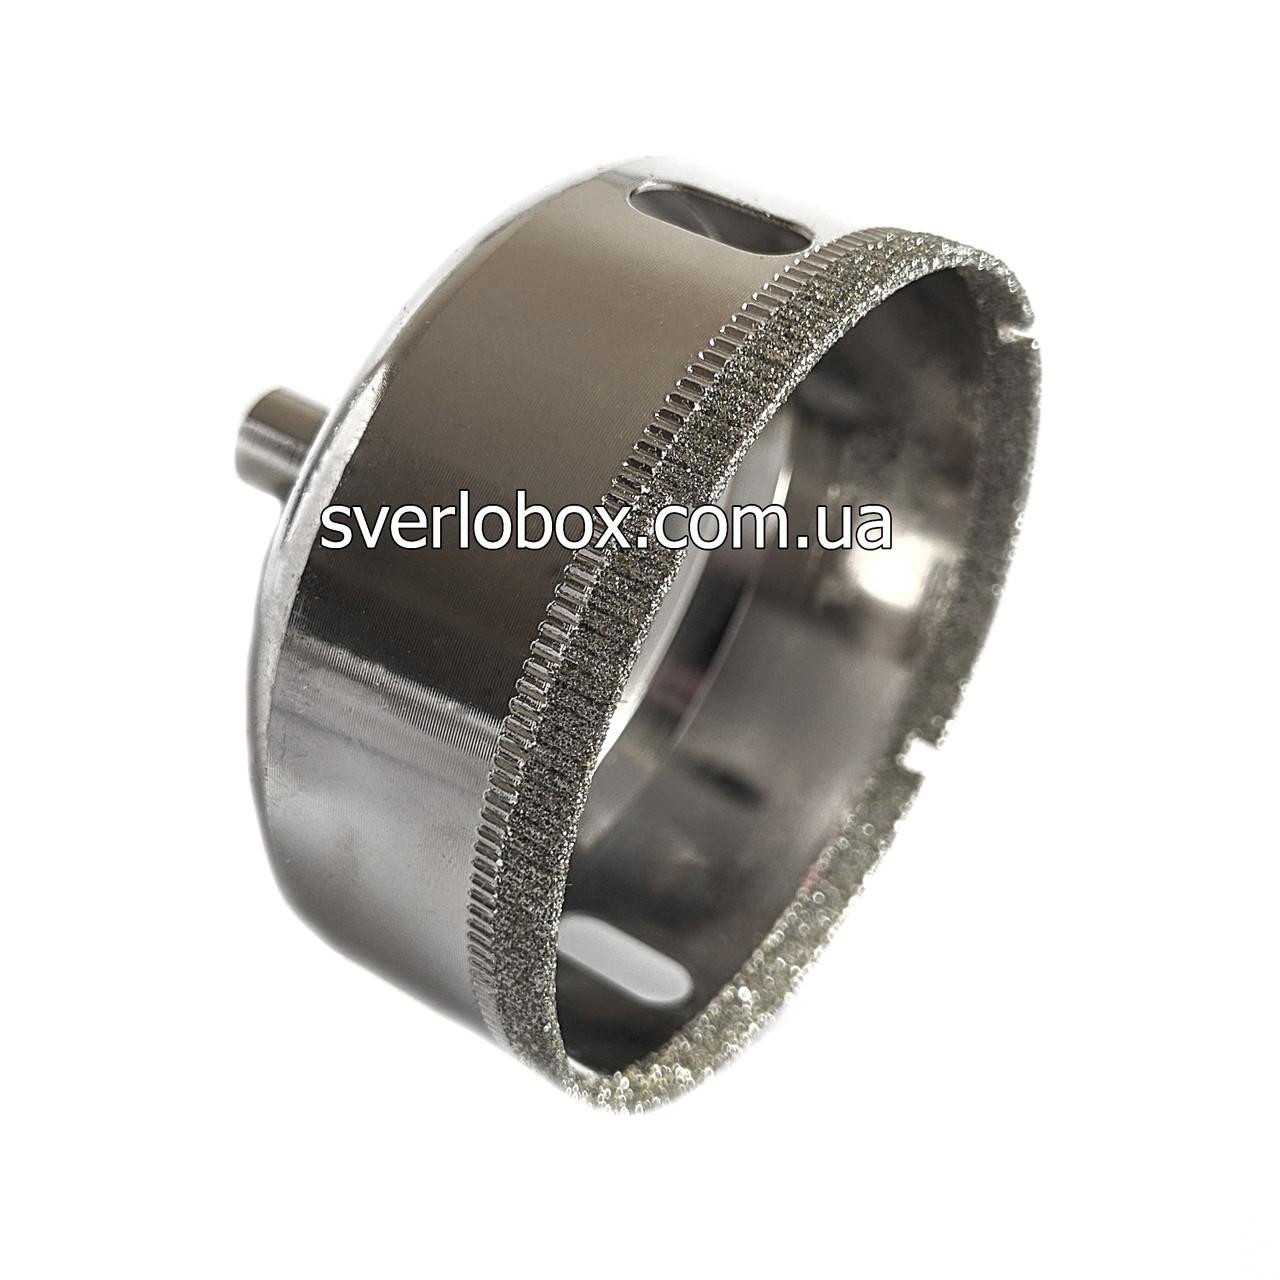 Коронка алмазная 75 мм